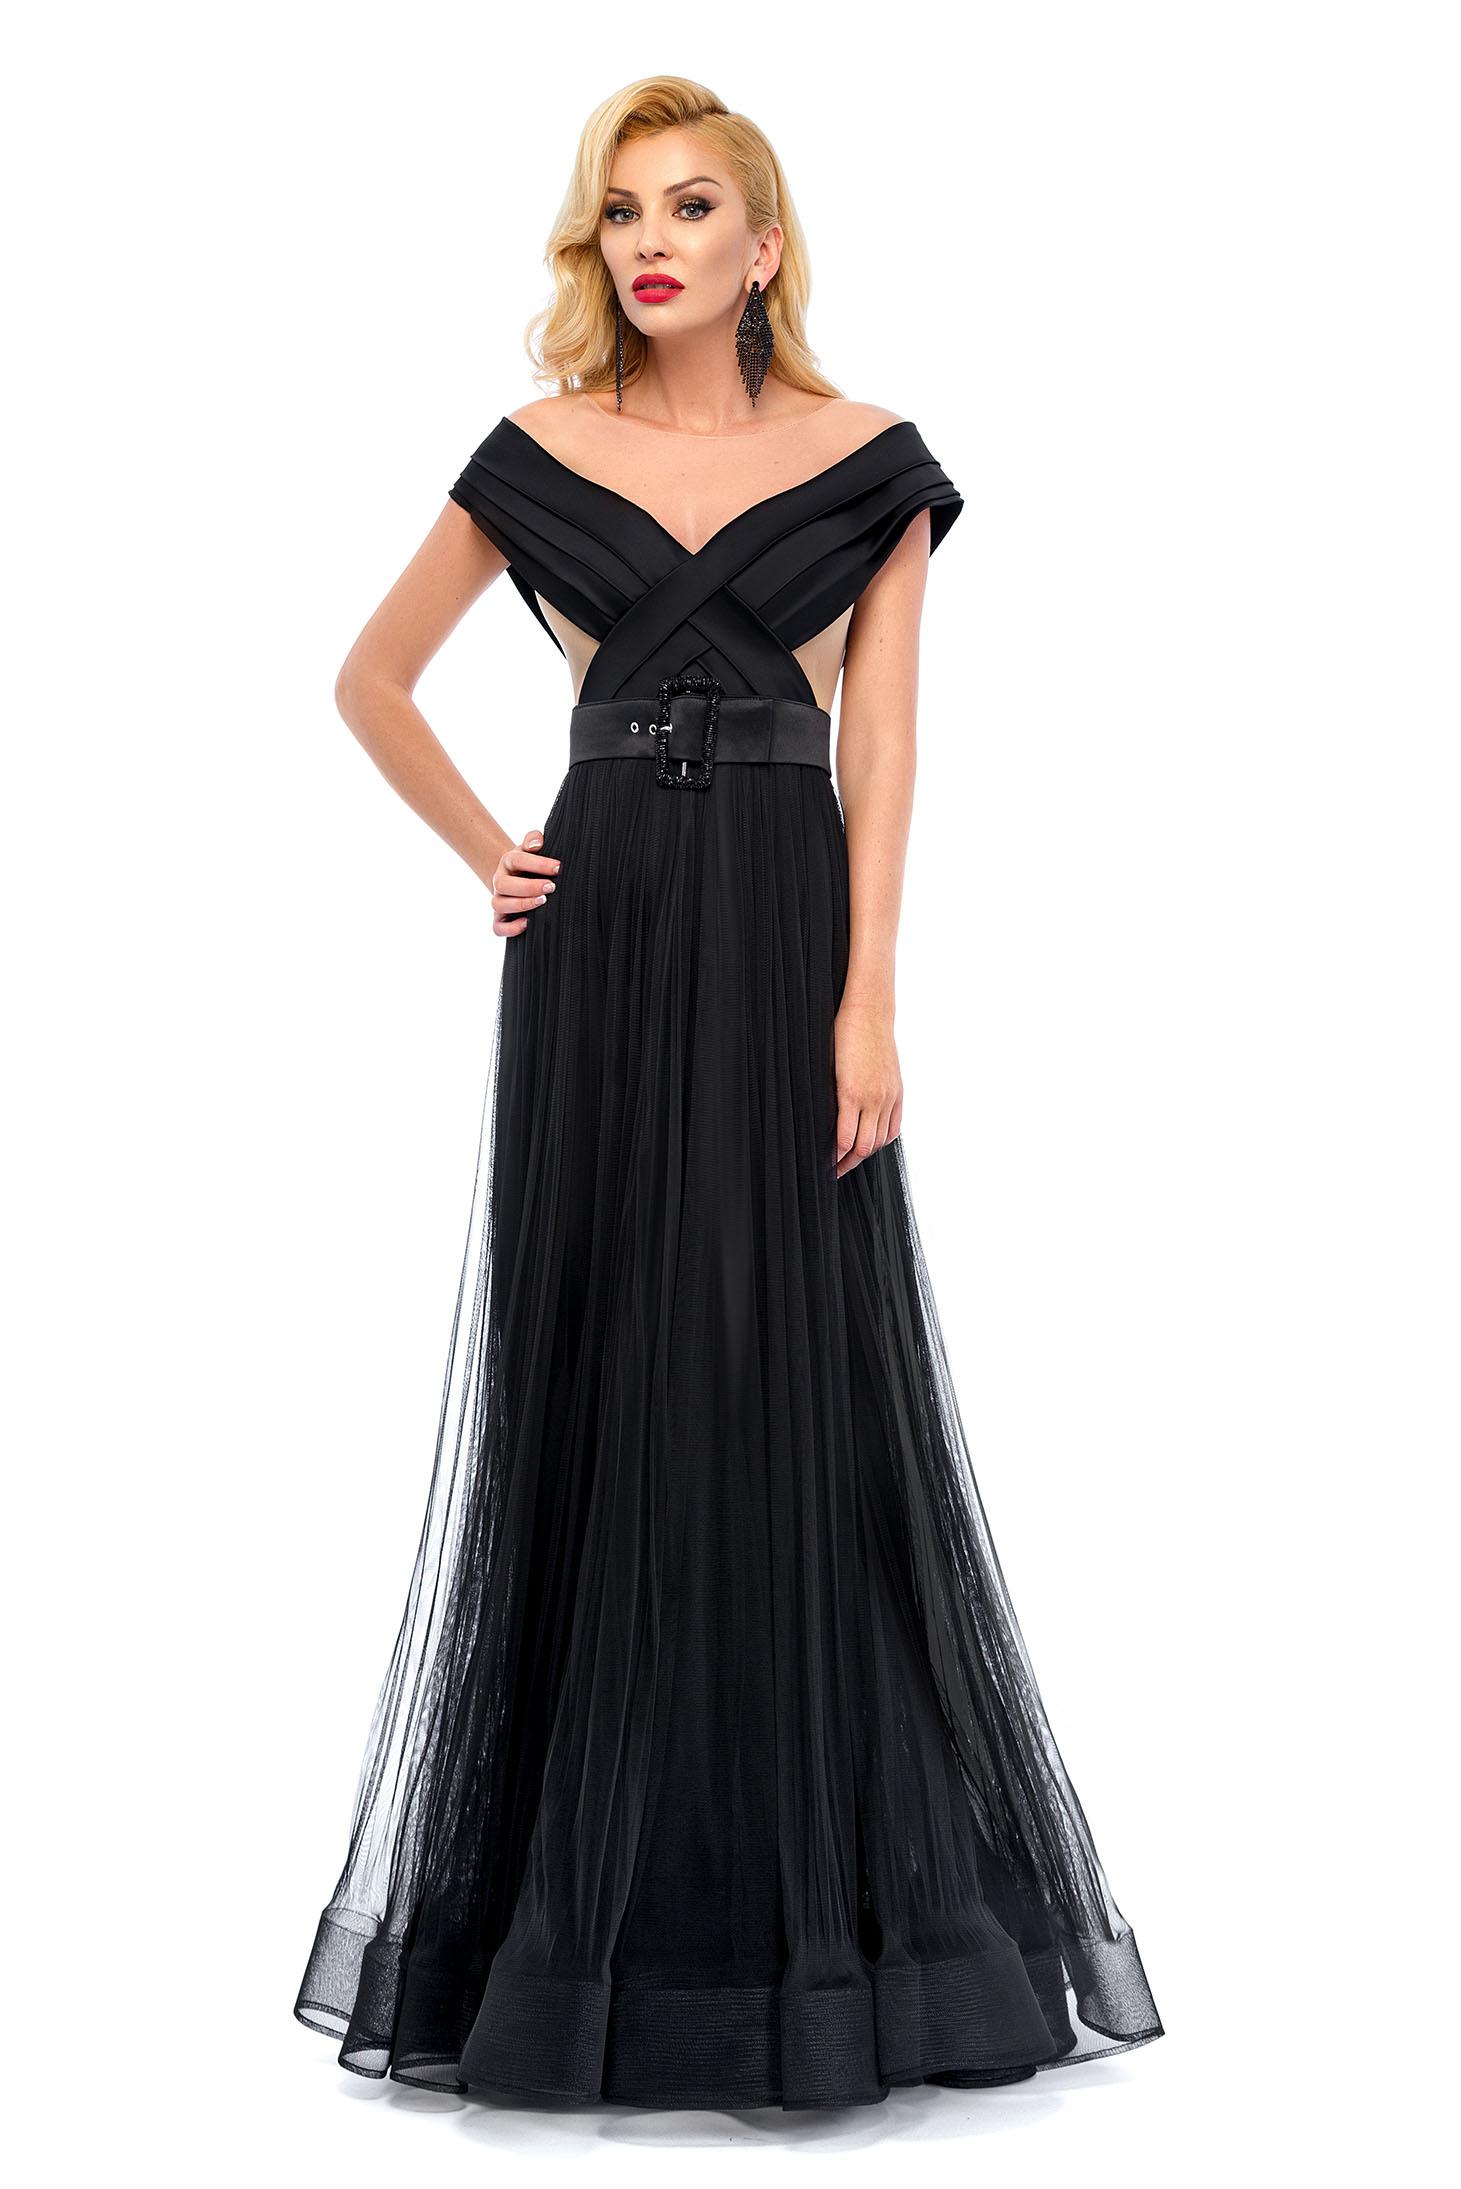 Rochie de ocazie Ana Radu neagra cu accesoriu tip curea